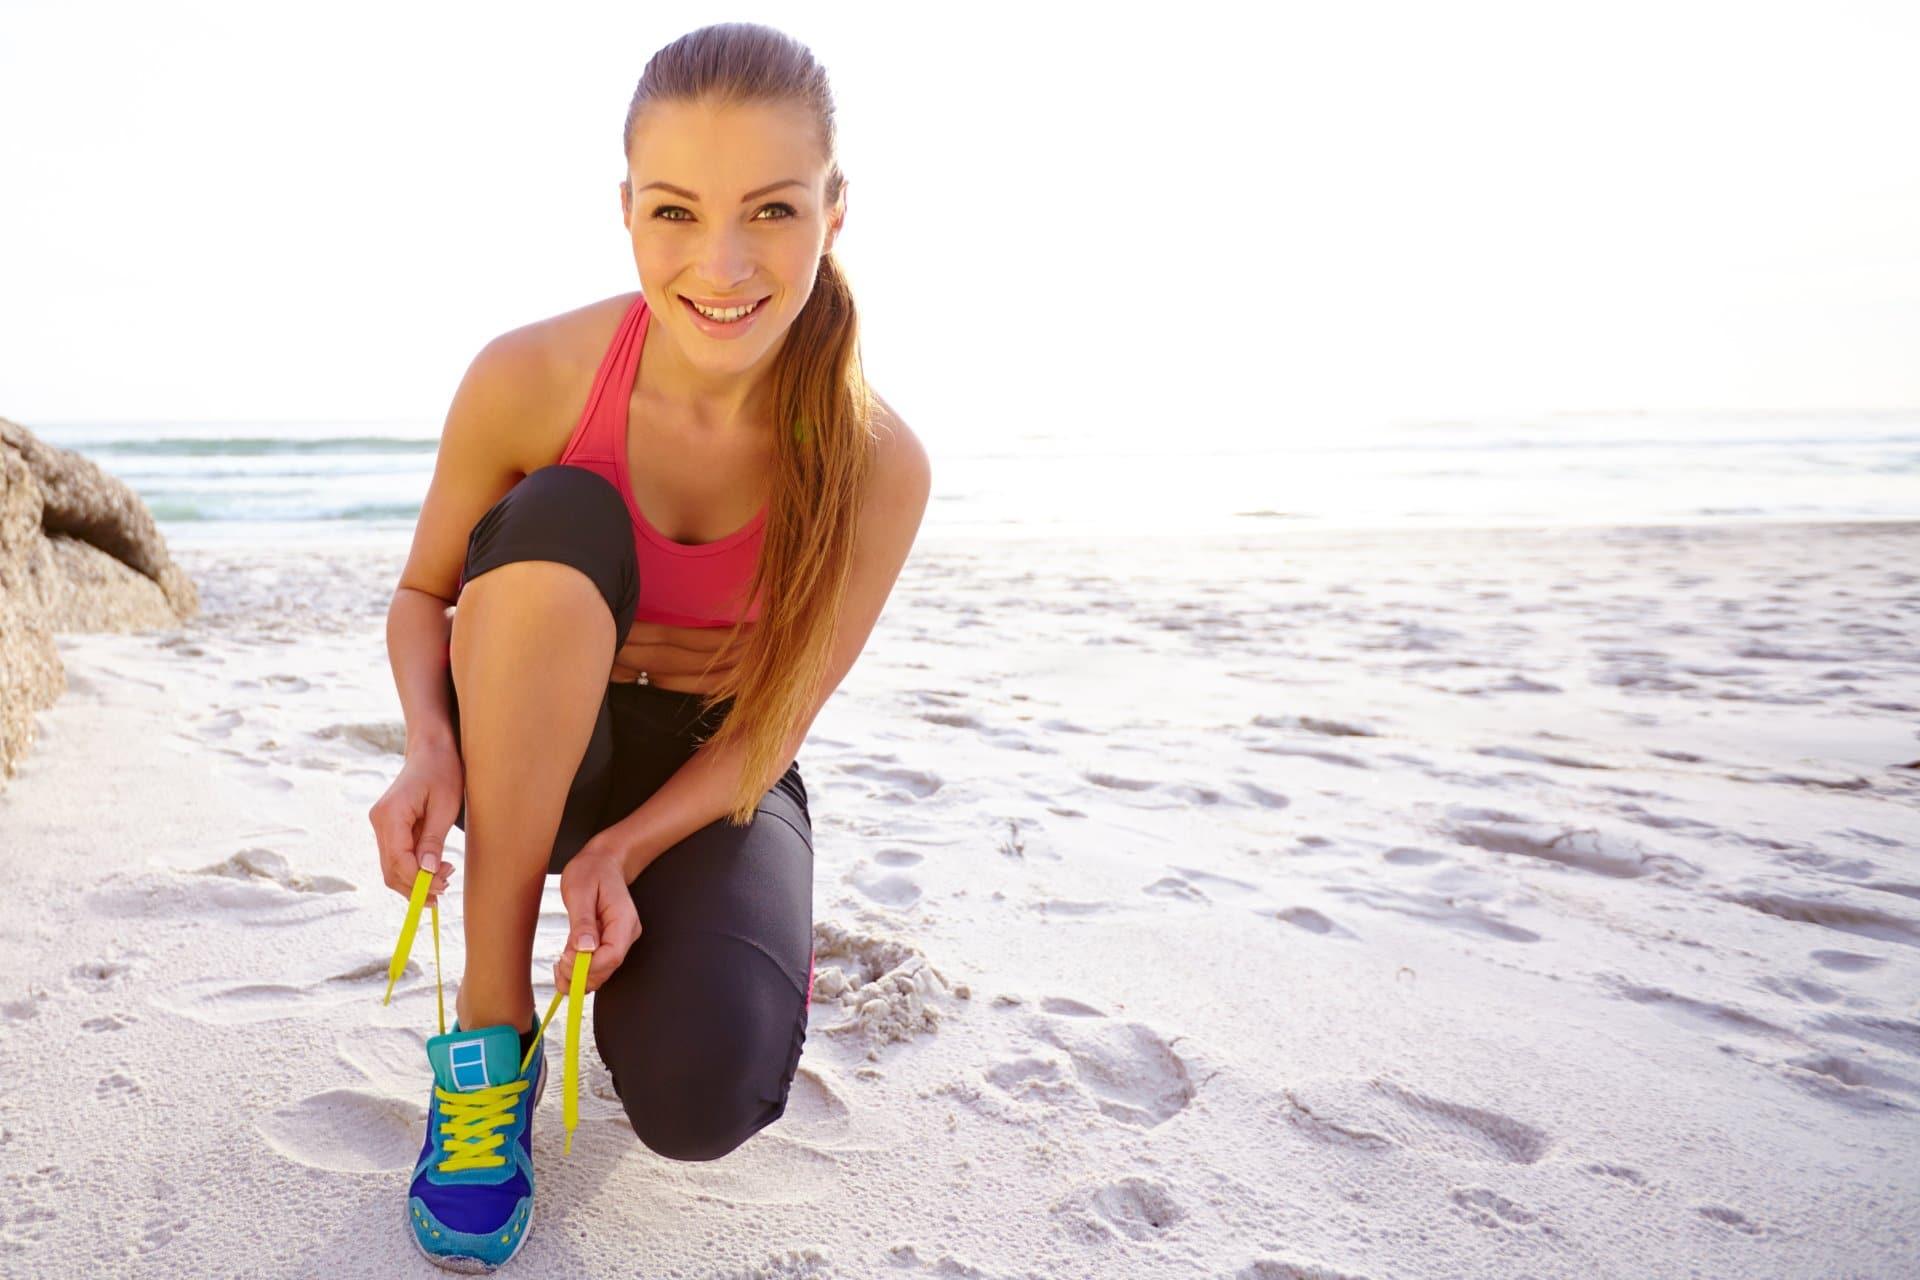 Frau Strand Jogging erfolgscoaching